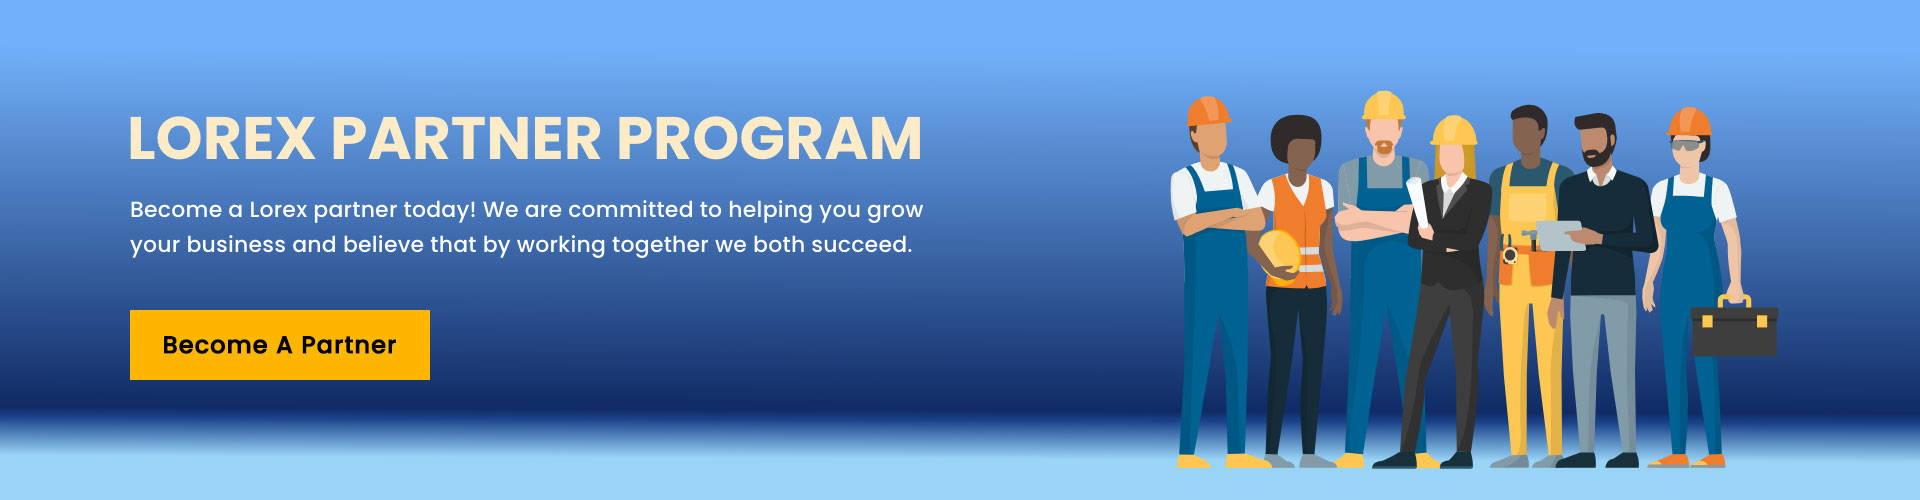 Lorex Partner Program